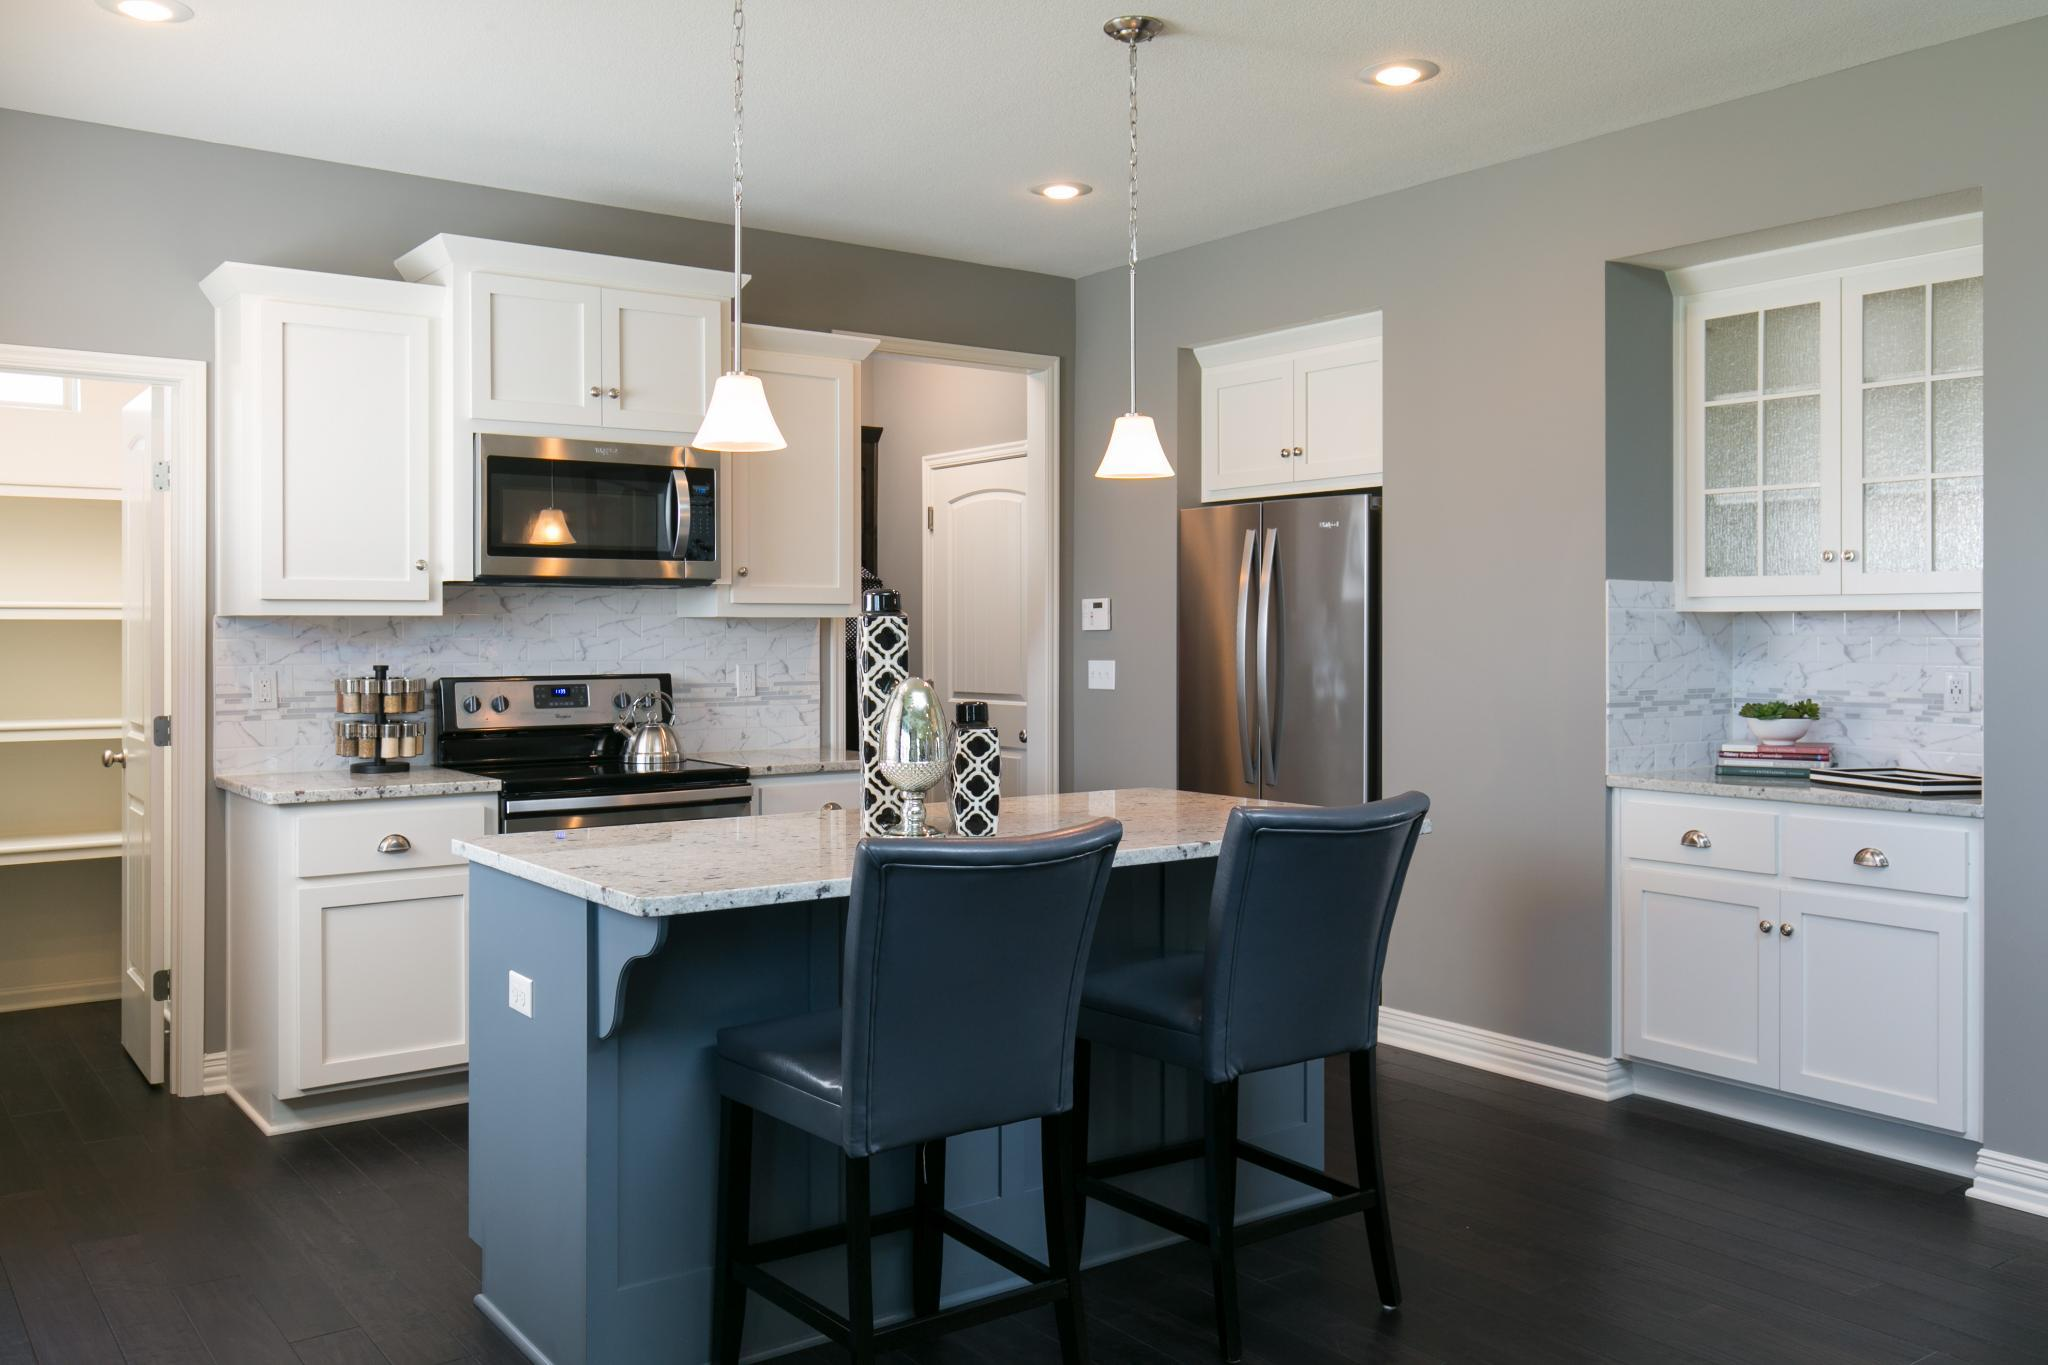 Kitchen featured in the Preston Ridge By Summit Homes in Kansas City, MO